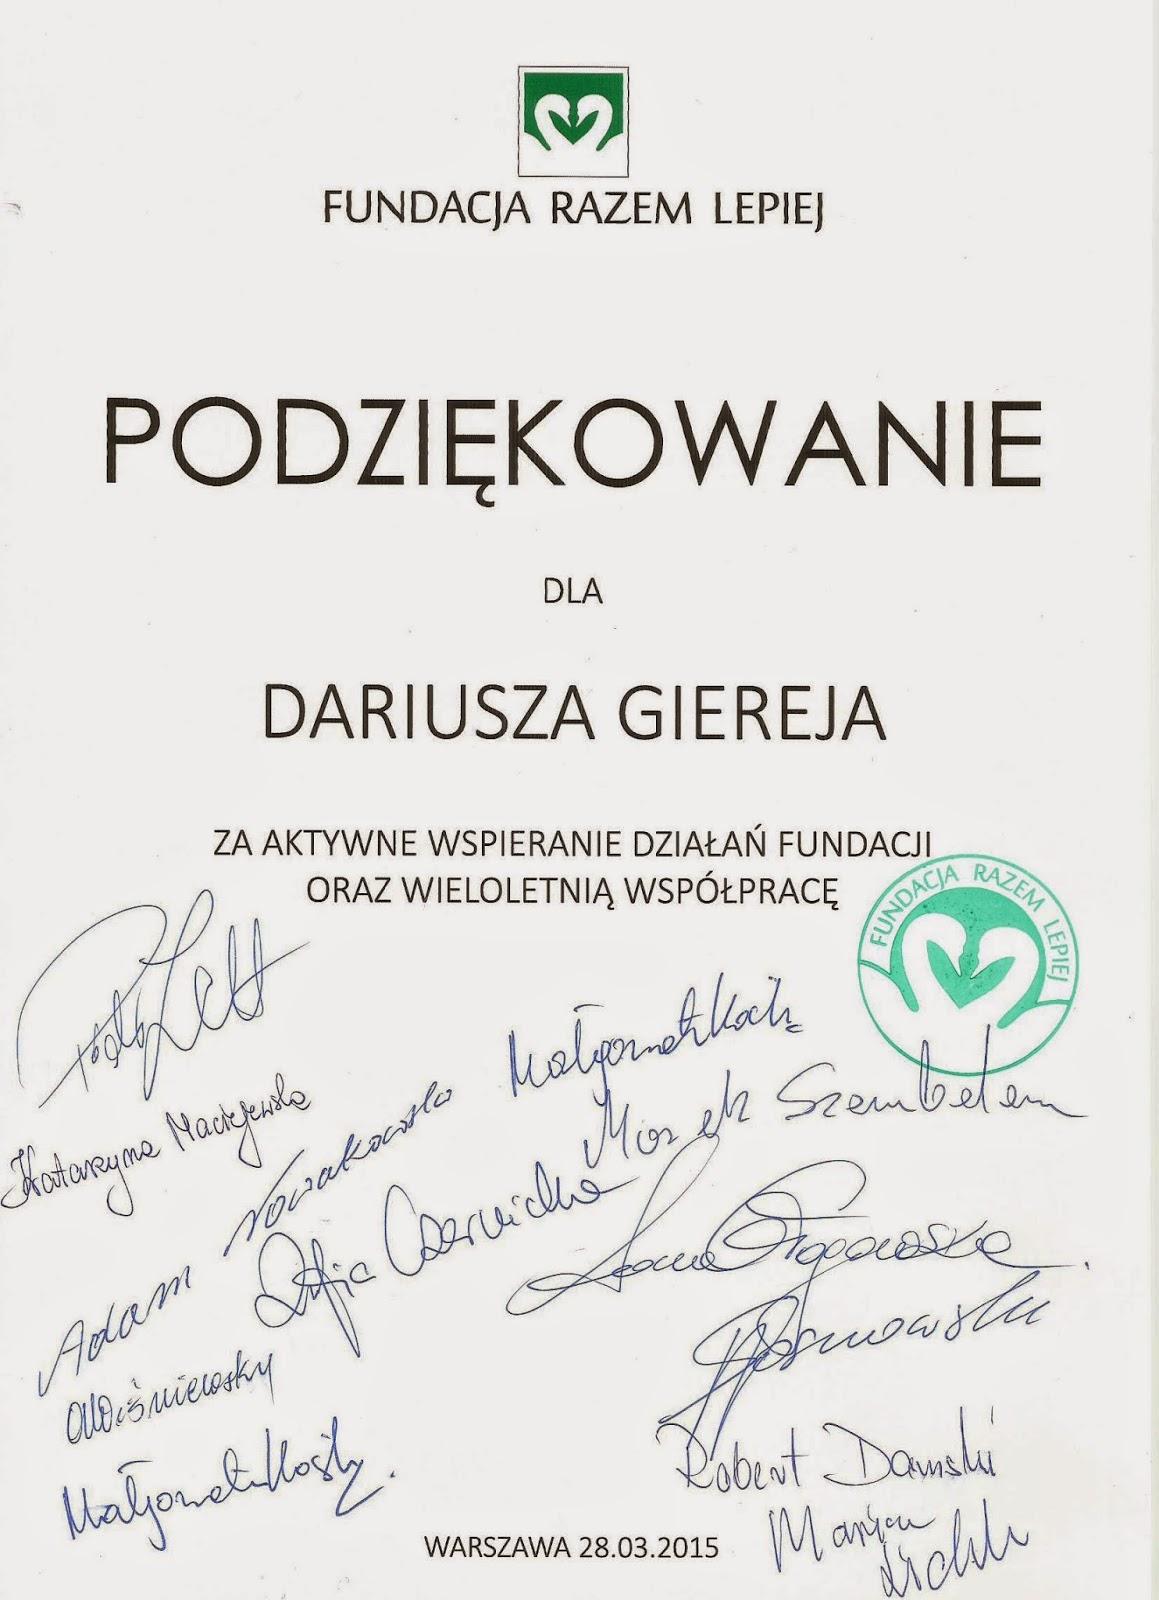 foto, (print screen) Dariusz Marek Gierej